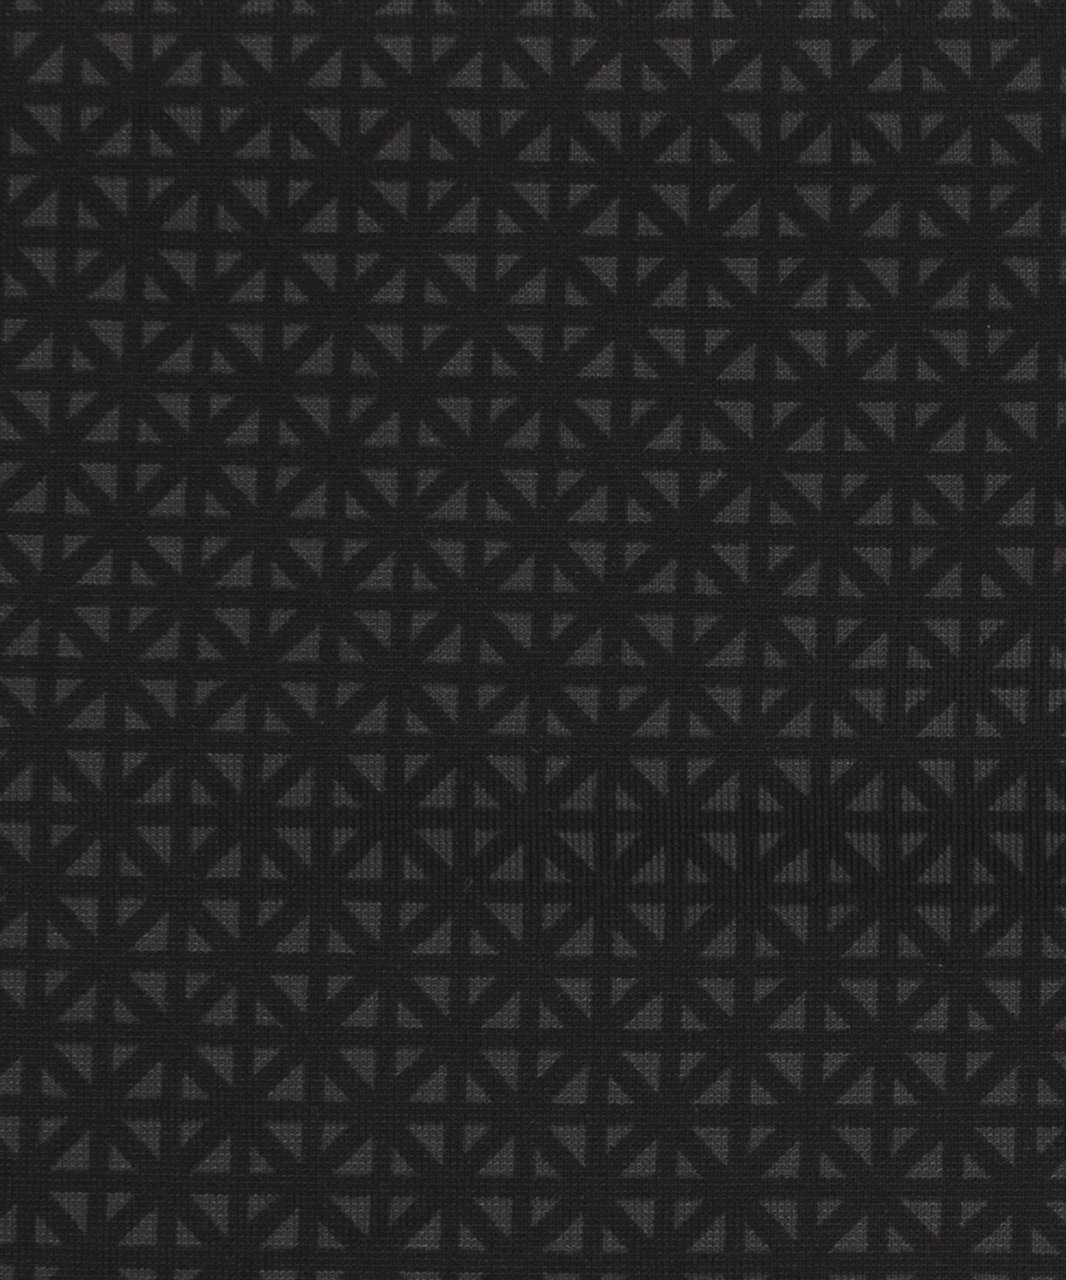 Lululemon Smooth Seamless Thong *3 Pack - Lattice Work Mini Graphite Grey Black / Lattice Work Mini Misty Shell Pink Pastel / Lattice Work Mini White Chrome